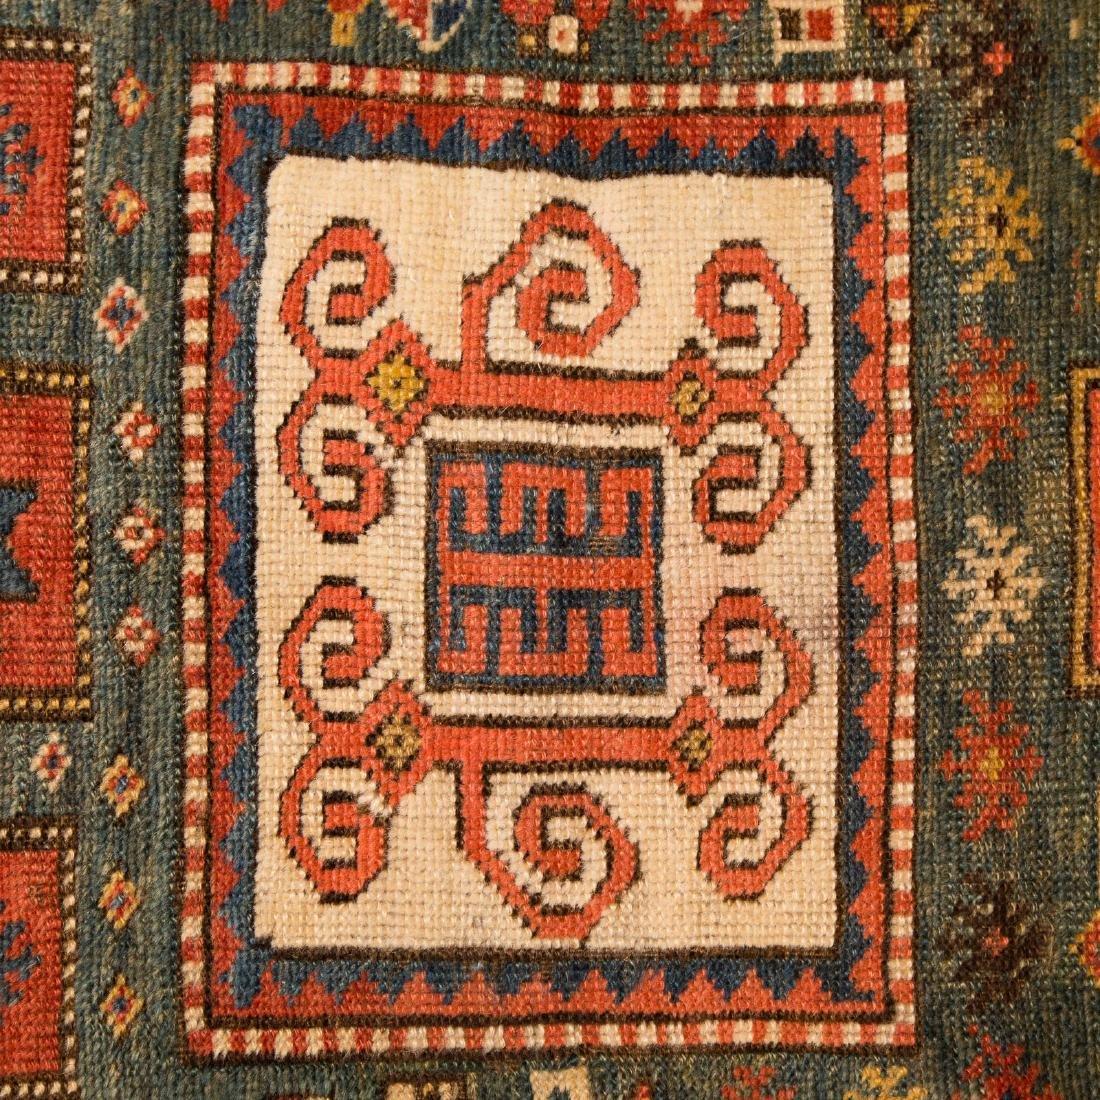 Antique Kazak rug, approx. 3.9 x 5.4 - 4